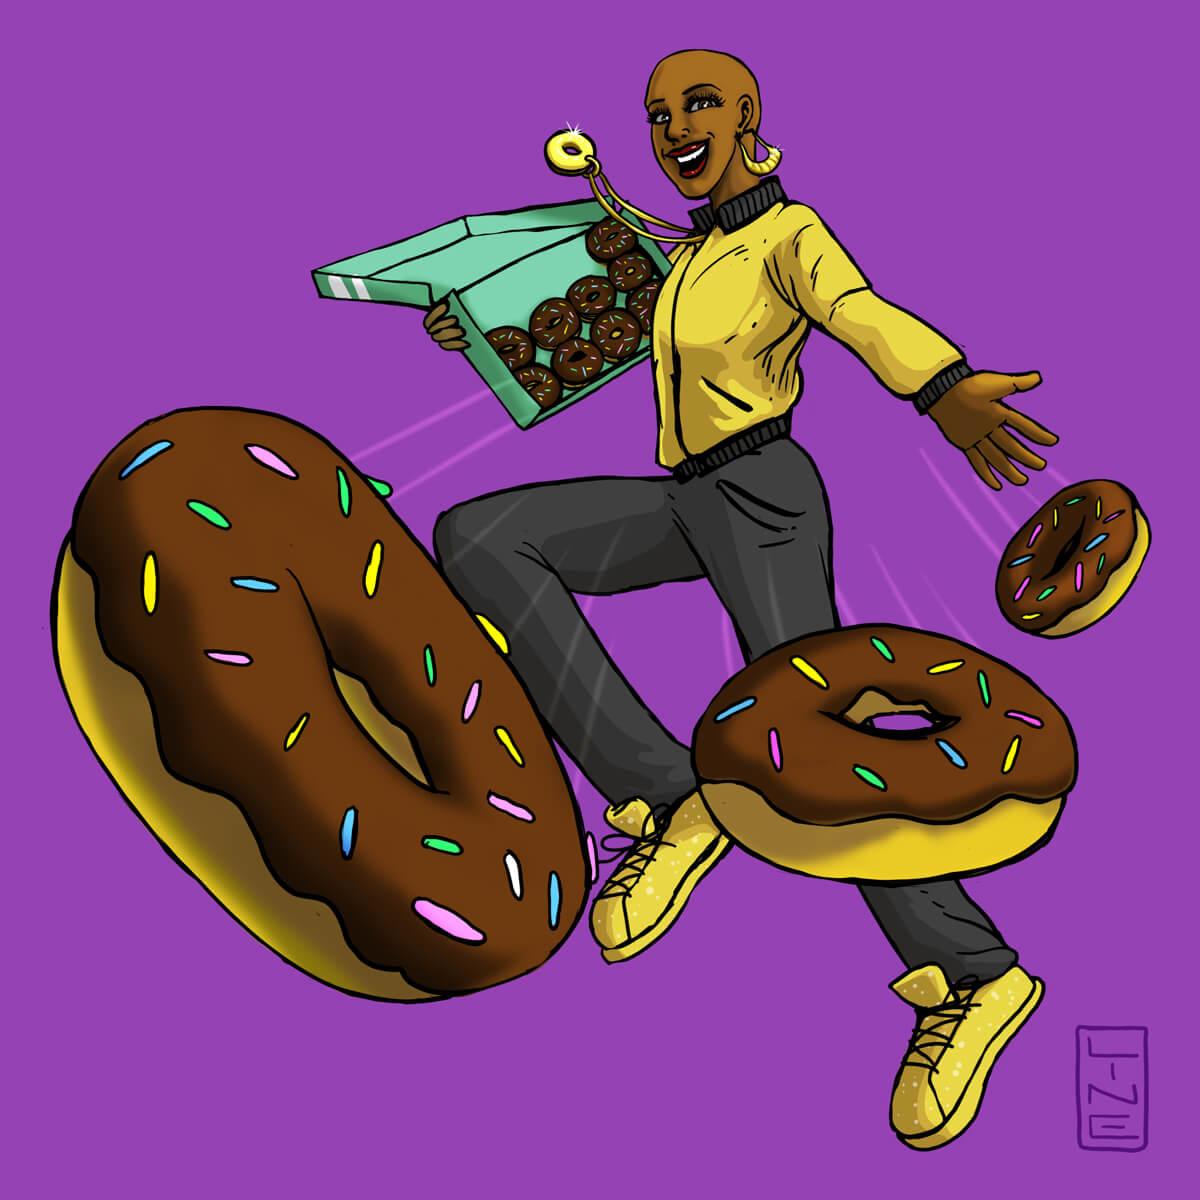 Mona Holmes the Doughnut Hero